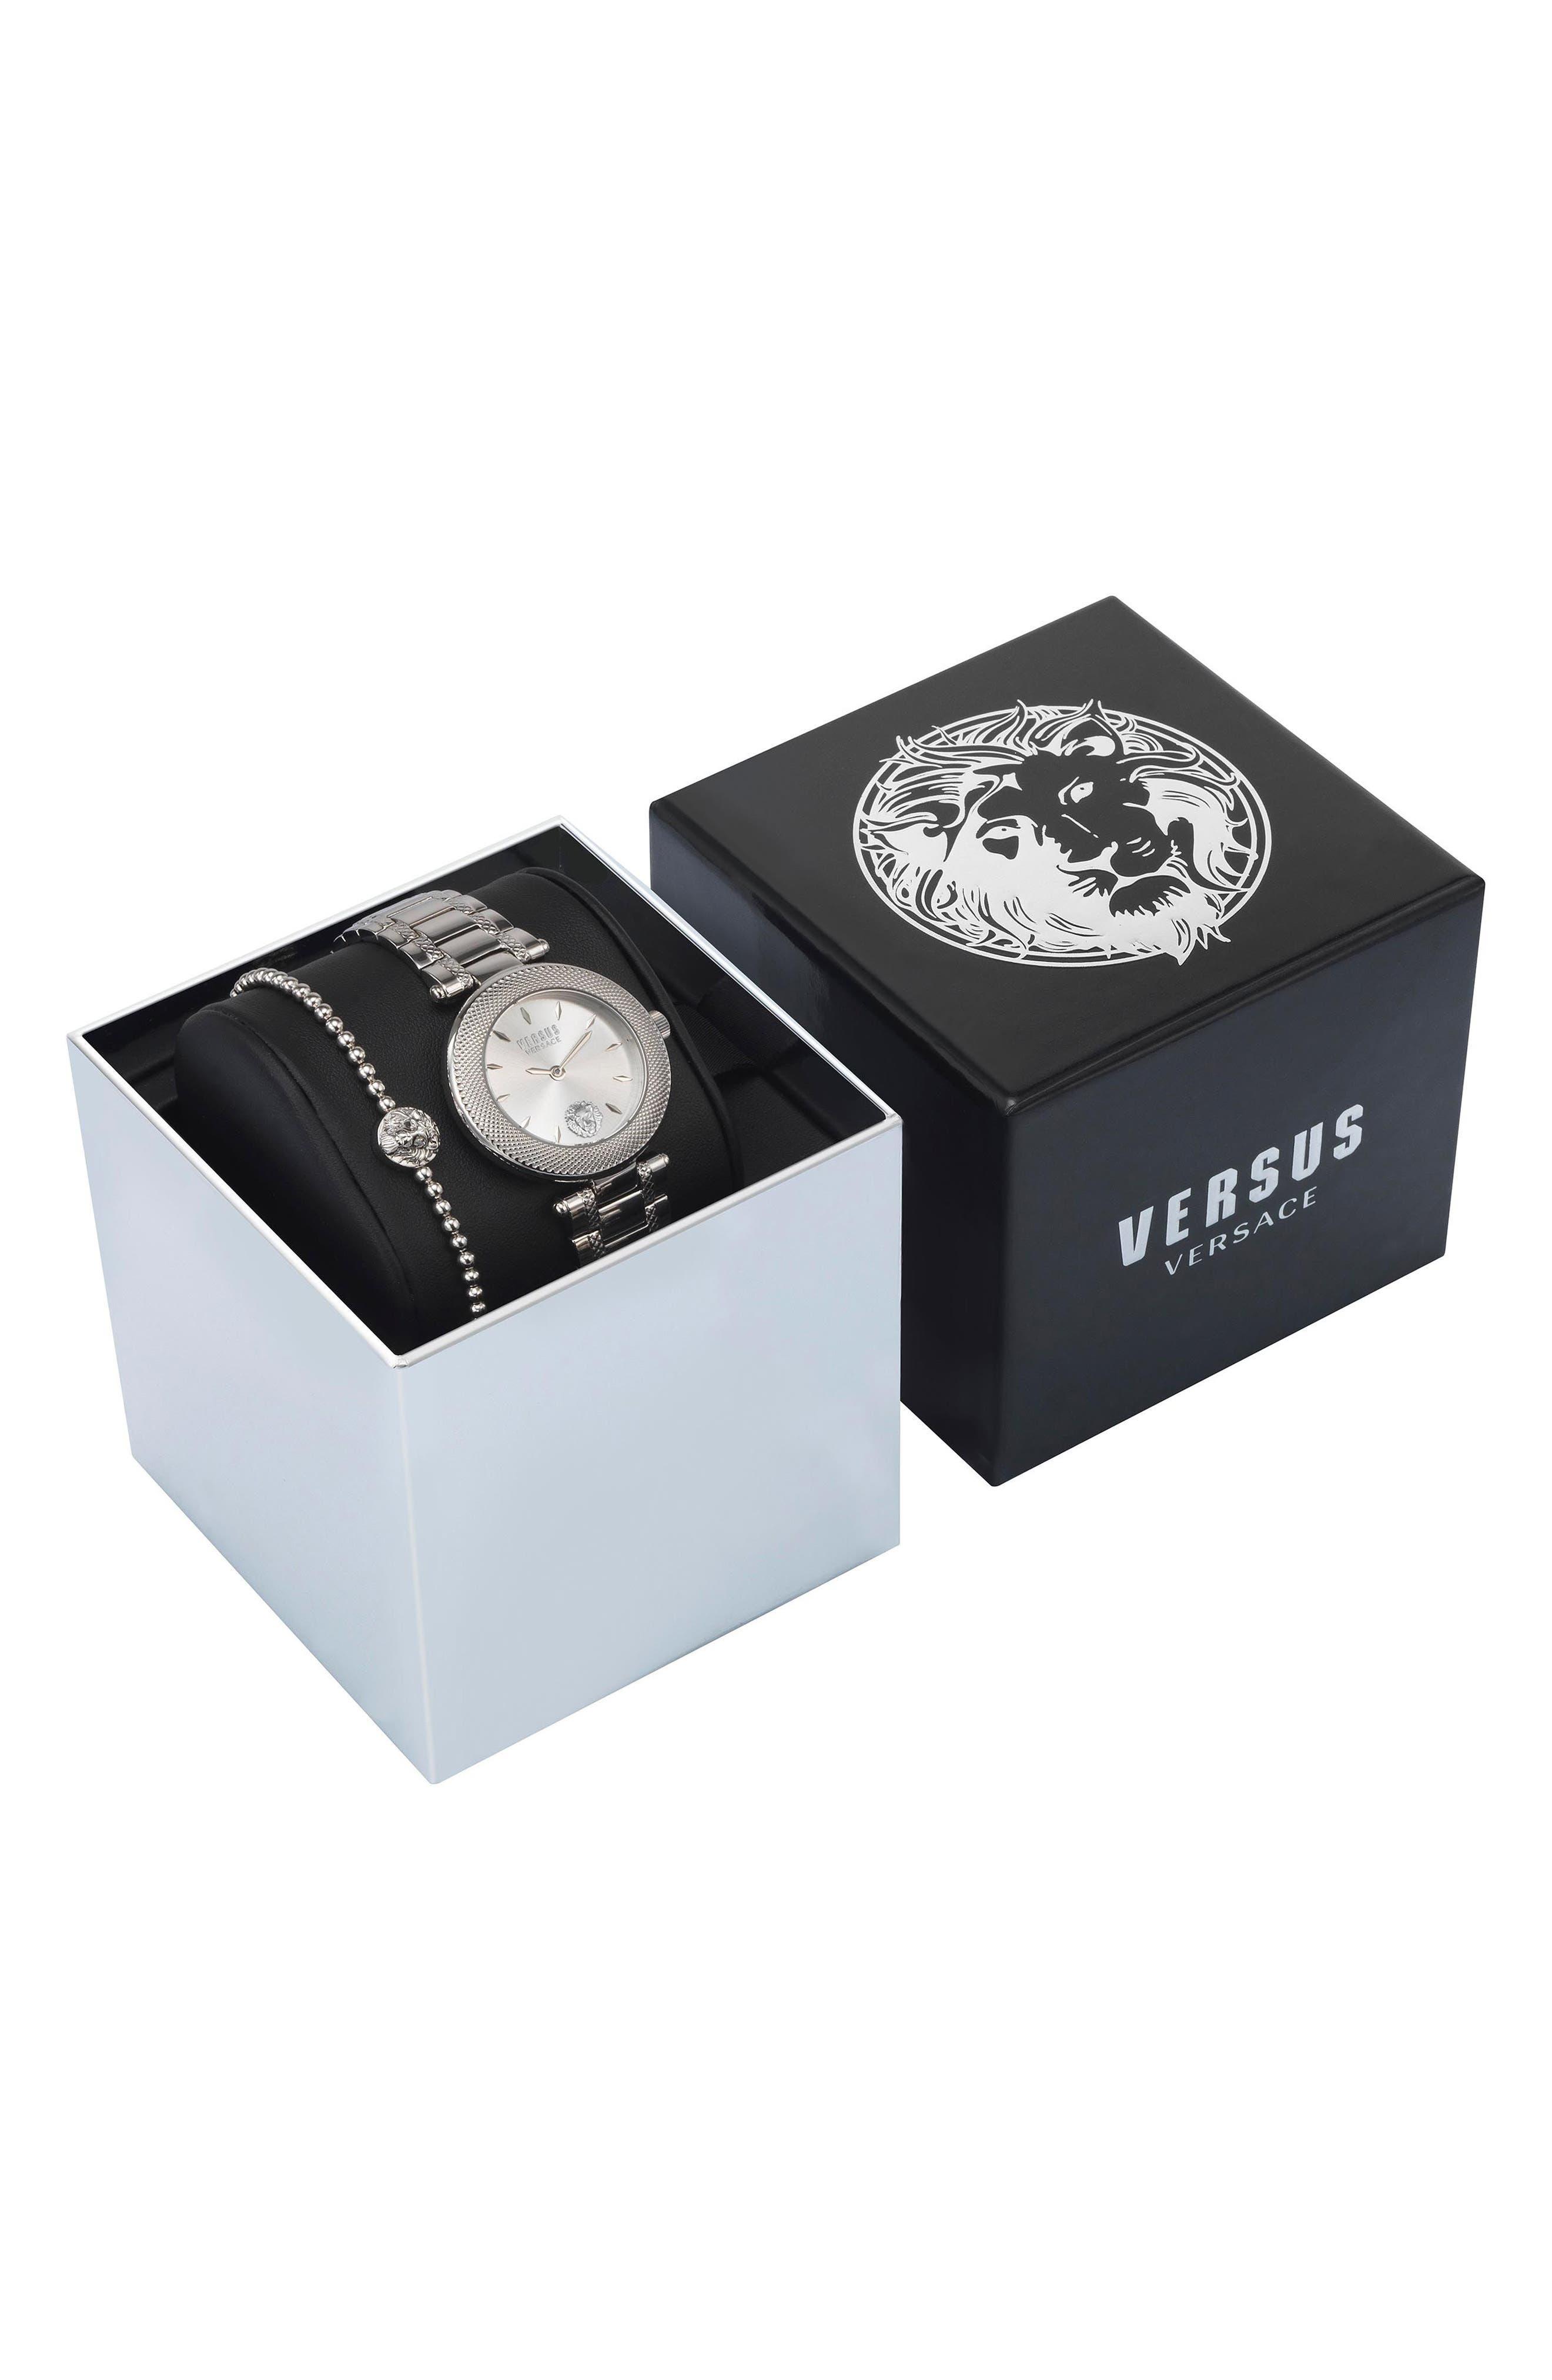 VERSUS VERSACE, Bricklane Watch Set, 36mm, Alternate thumbnail 3, color, SILVER